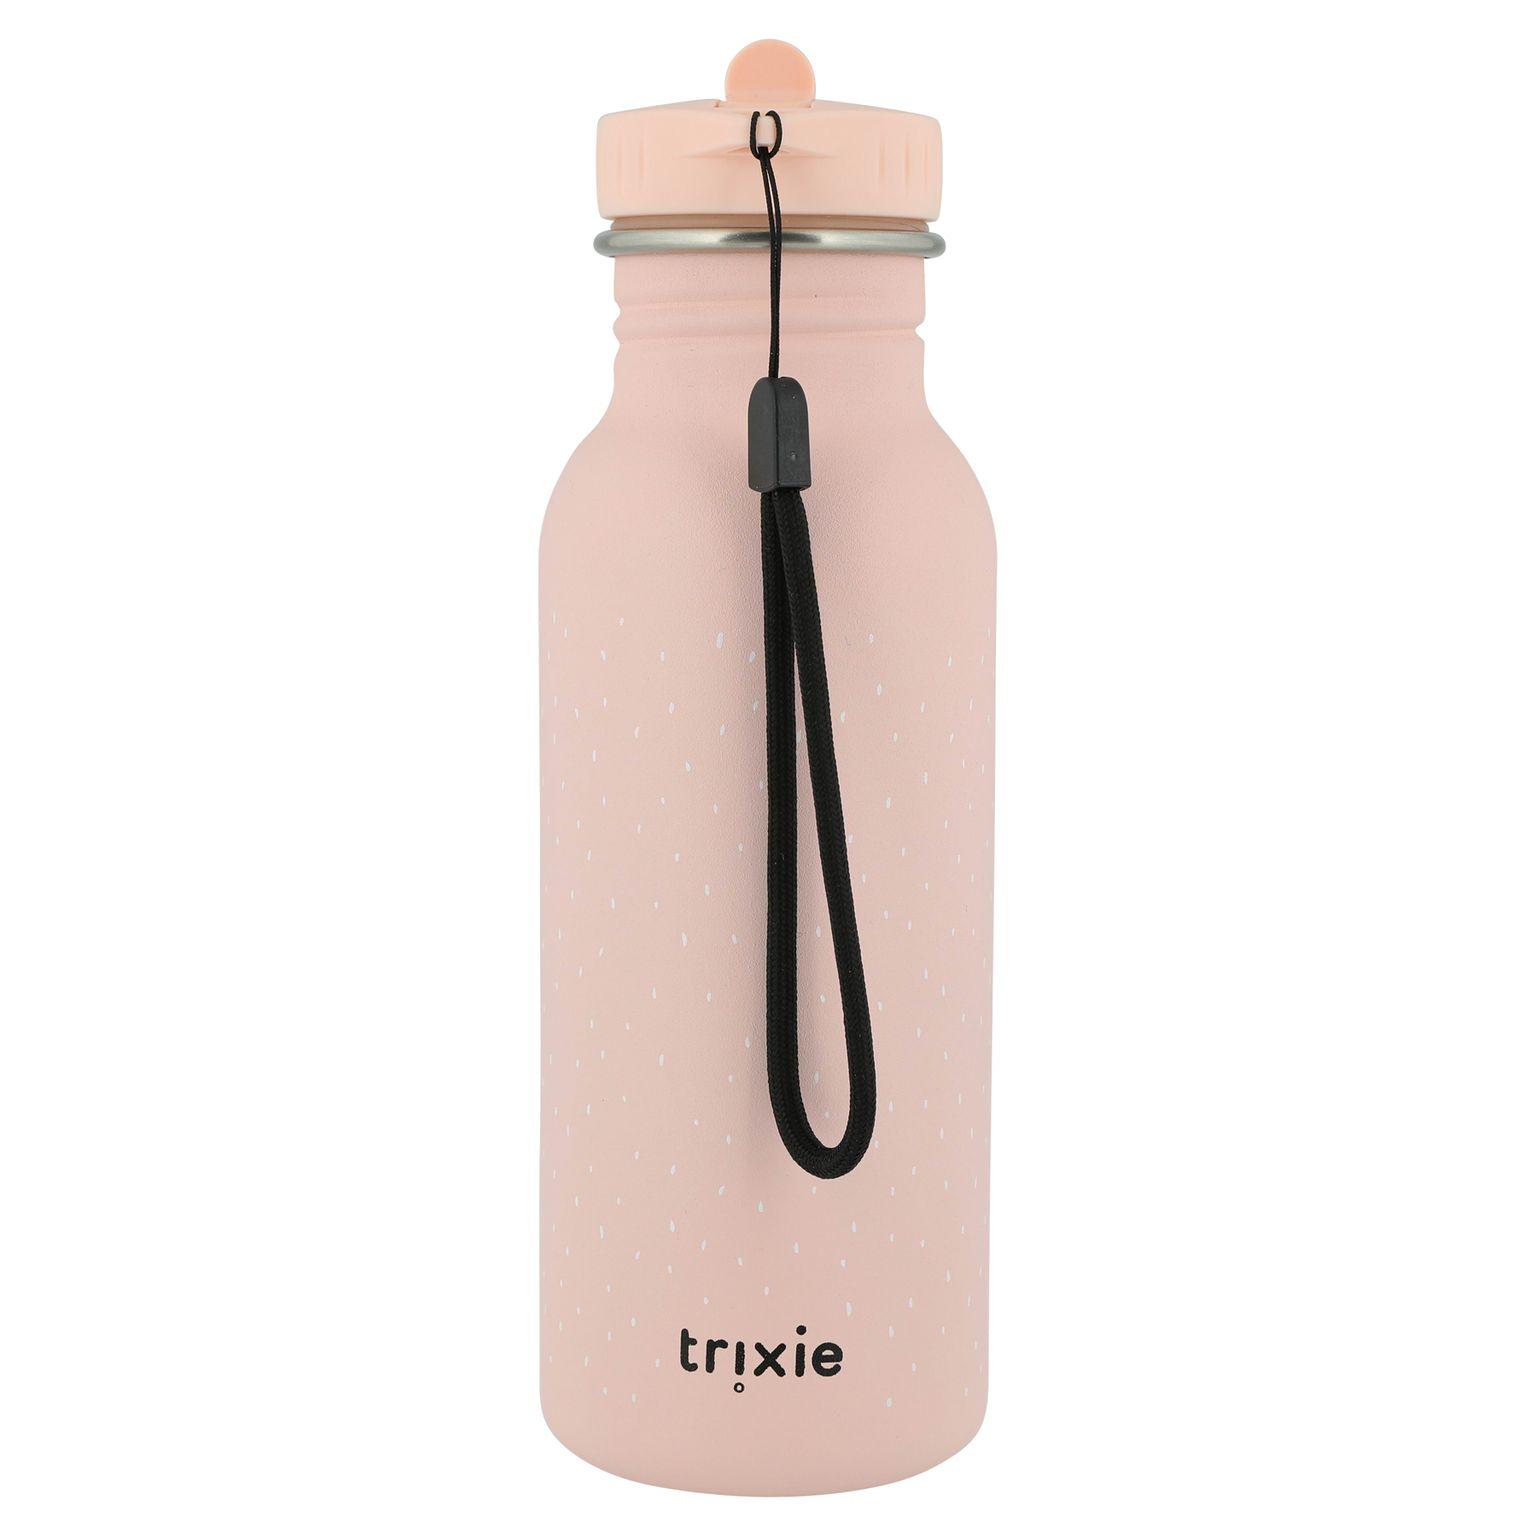 Afbeelding Trixie drinkfles 500ml – Mrs Rabbit